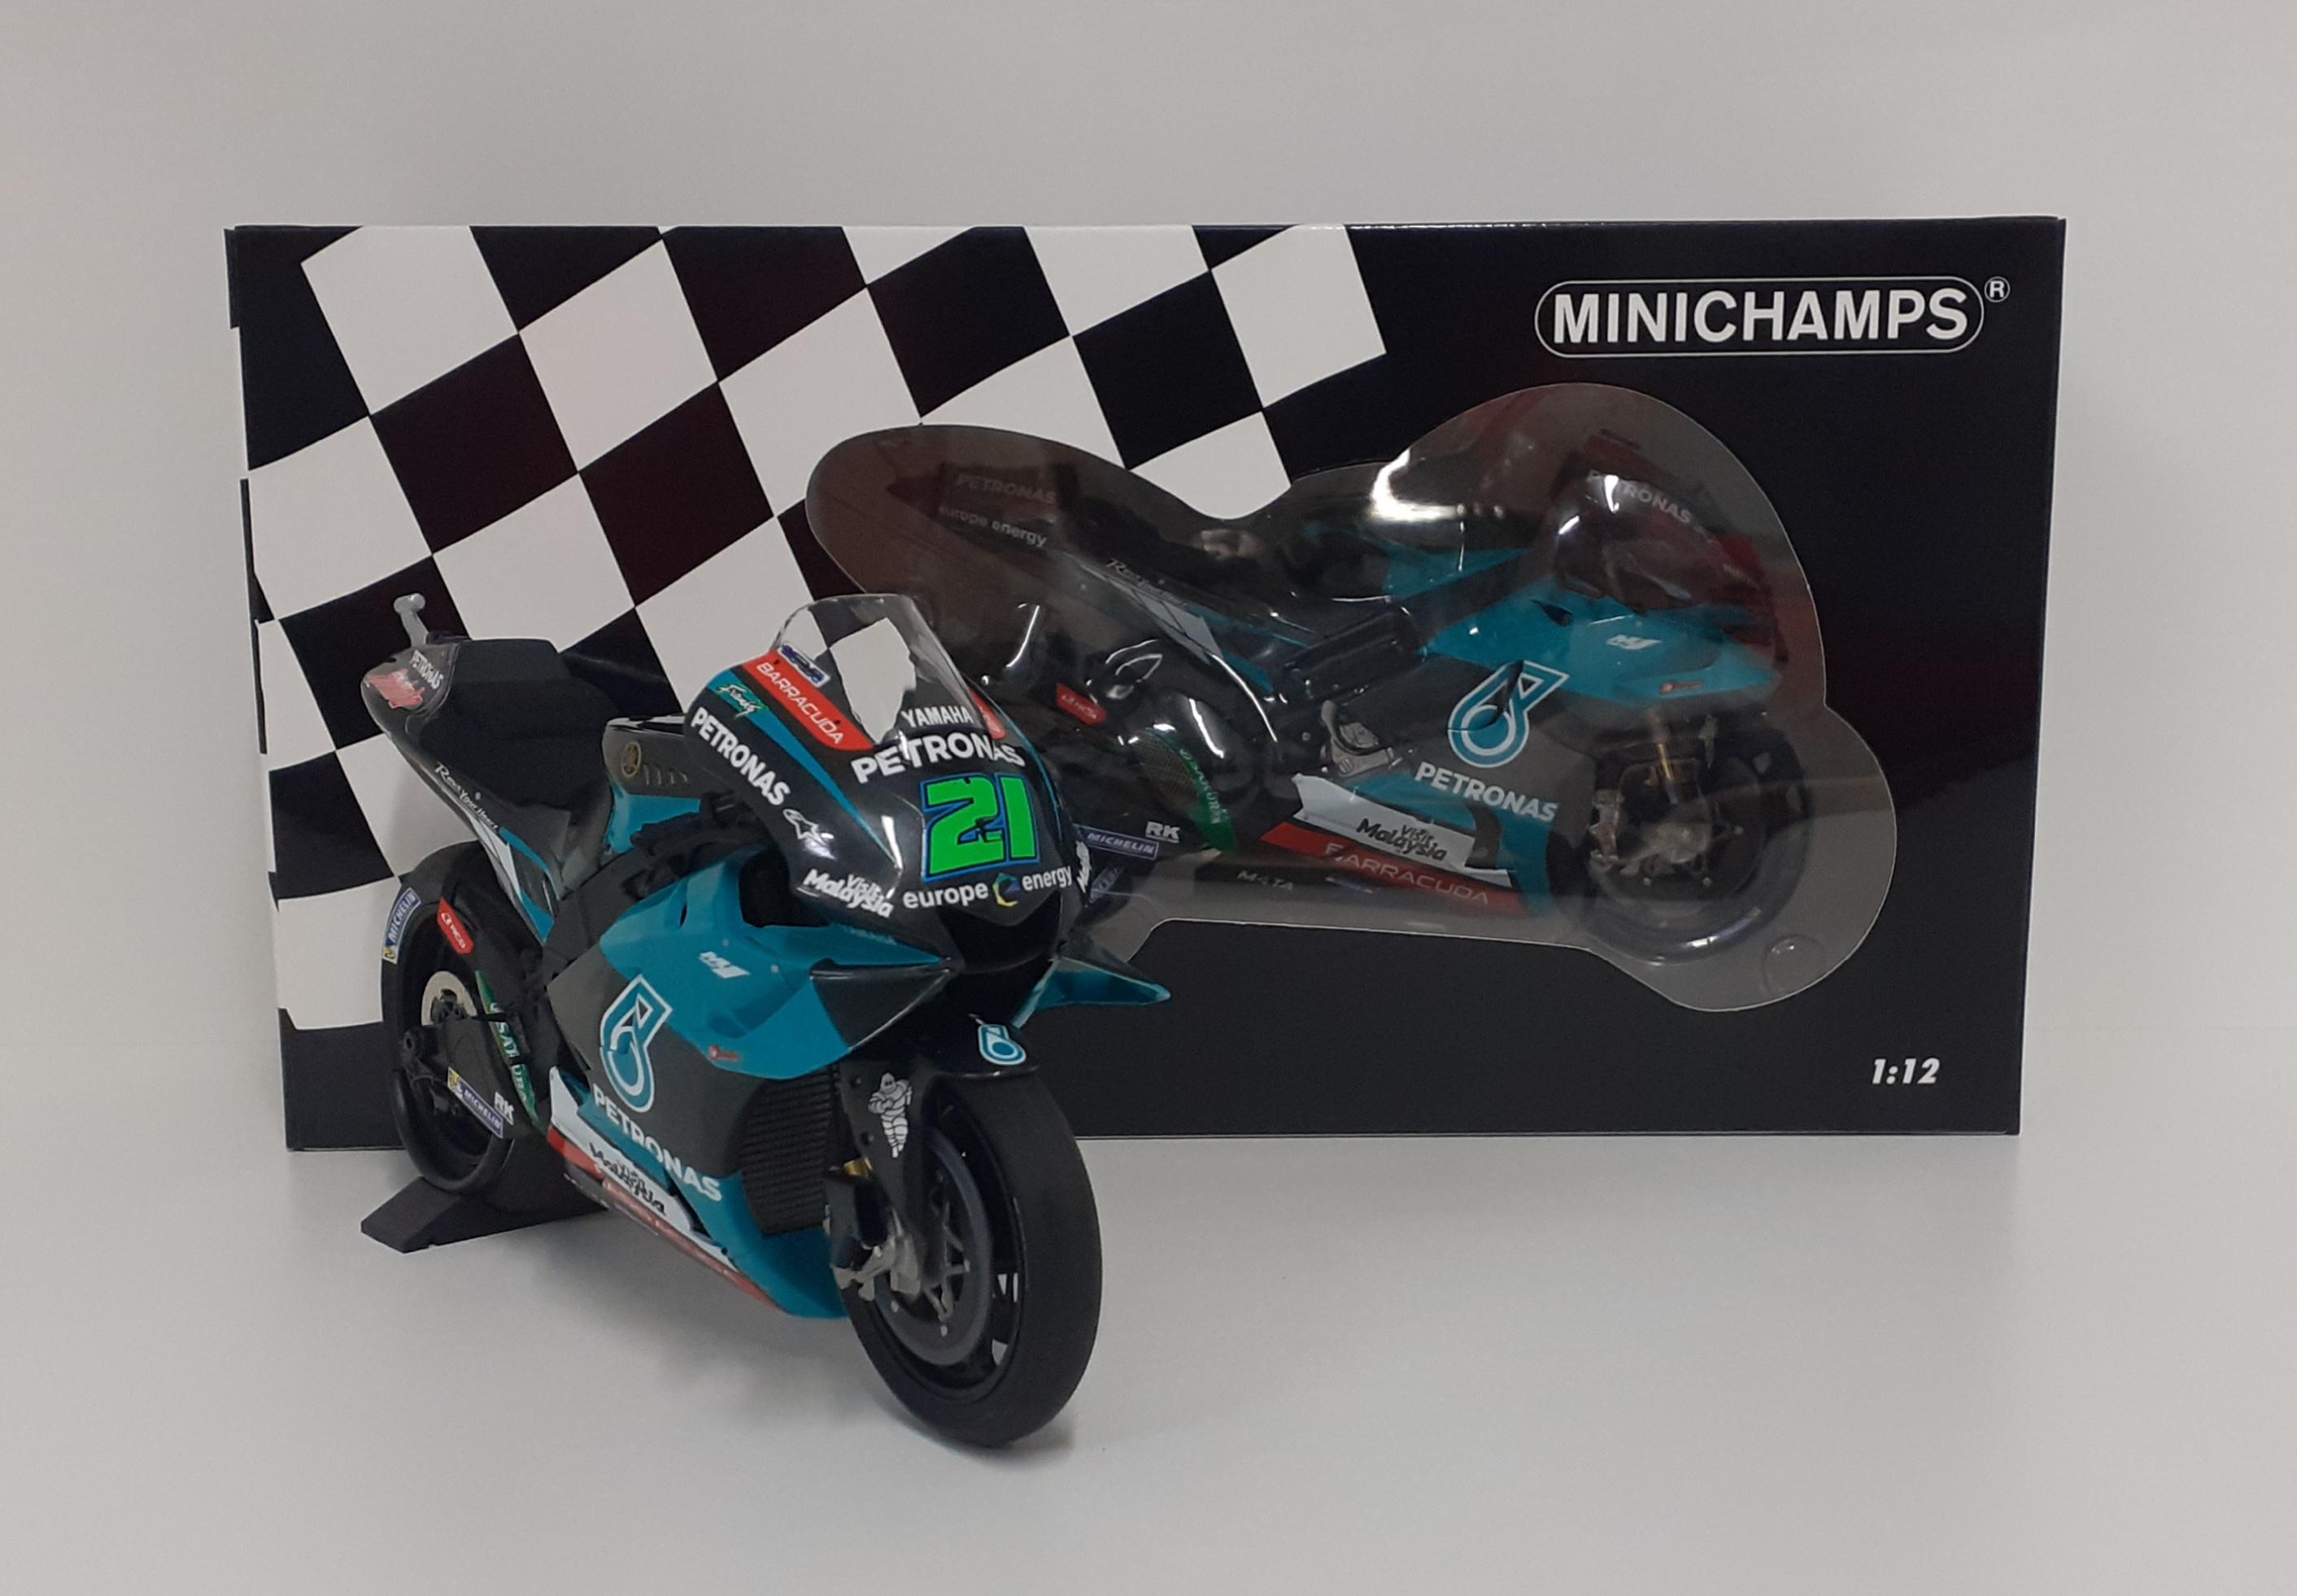 MINICHAMPS 1/12 MODELLINO MOTO YAMAHA M1 PETRONAS MORBIDELLI MOTOGP 2019 DIECAST